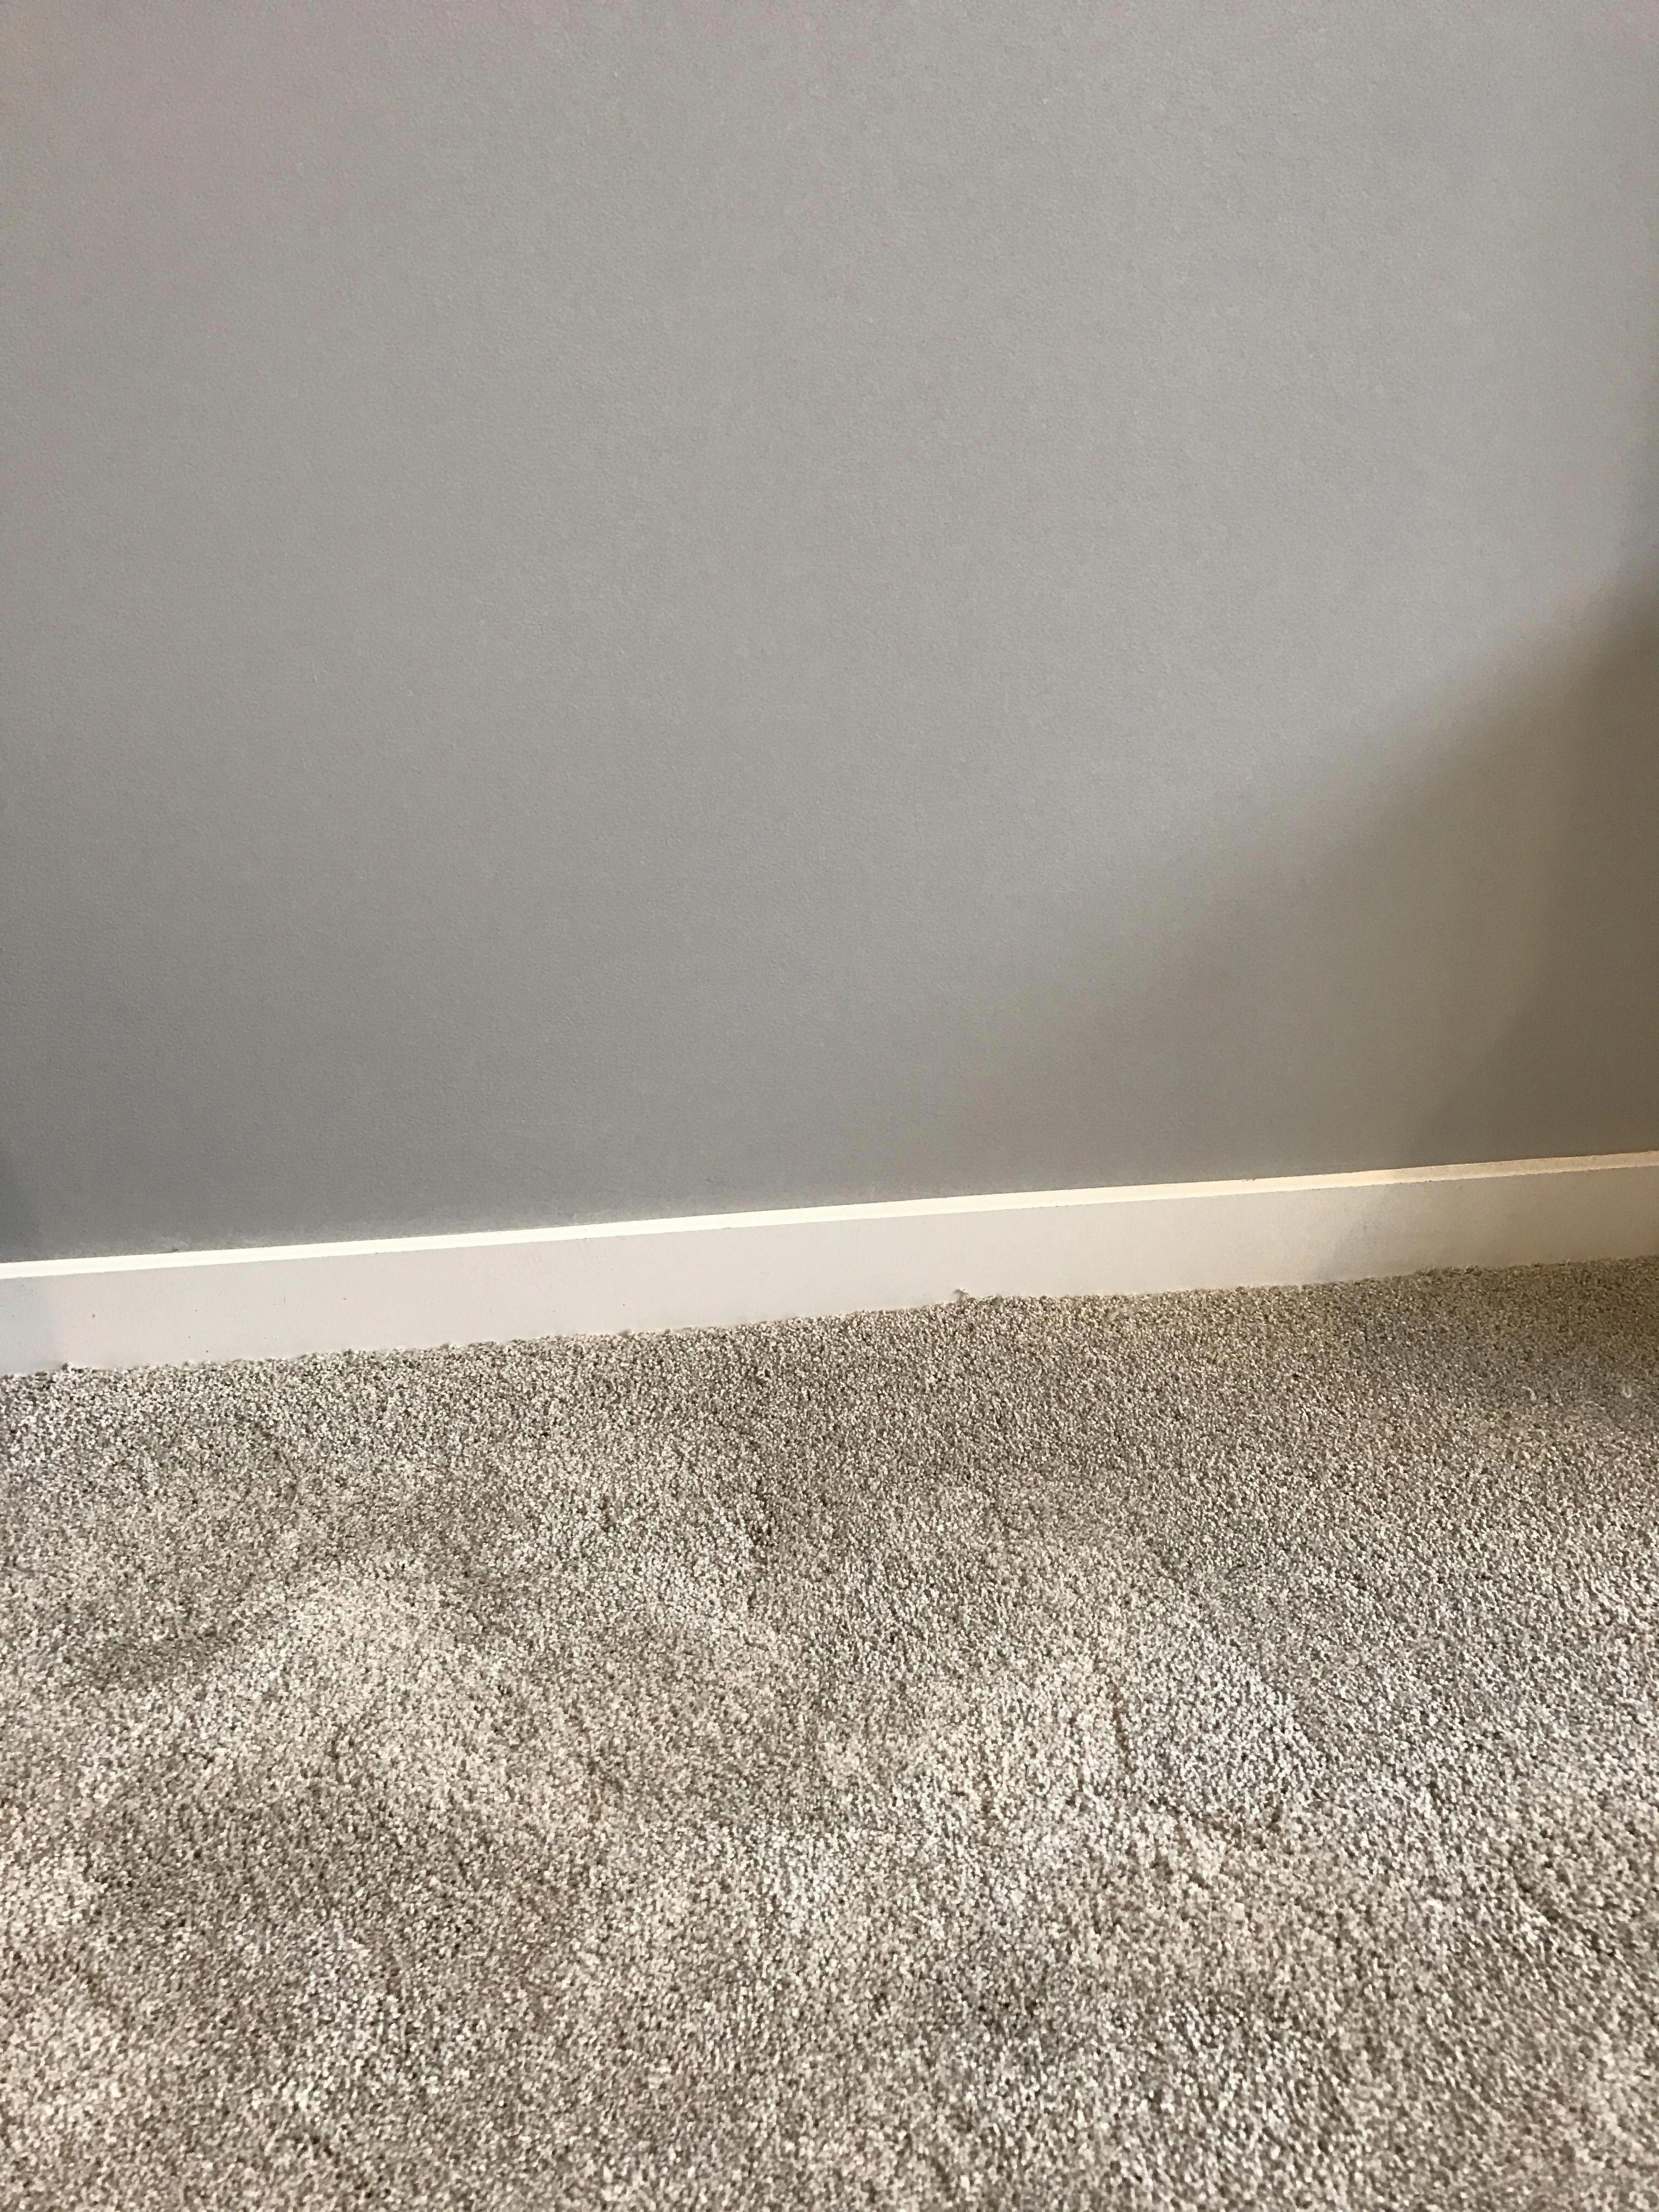 Carpet Runner Installation Guide Pinkcarpetrunnerrental Grey Walls And Carpet Brown Carpet Living Room Light Gray Carpet